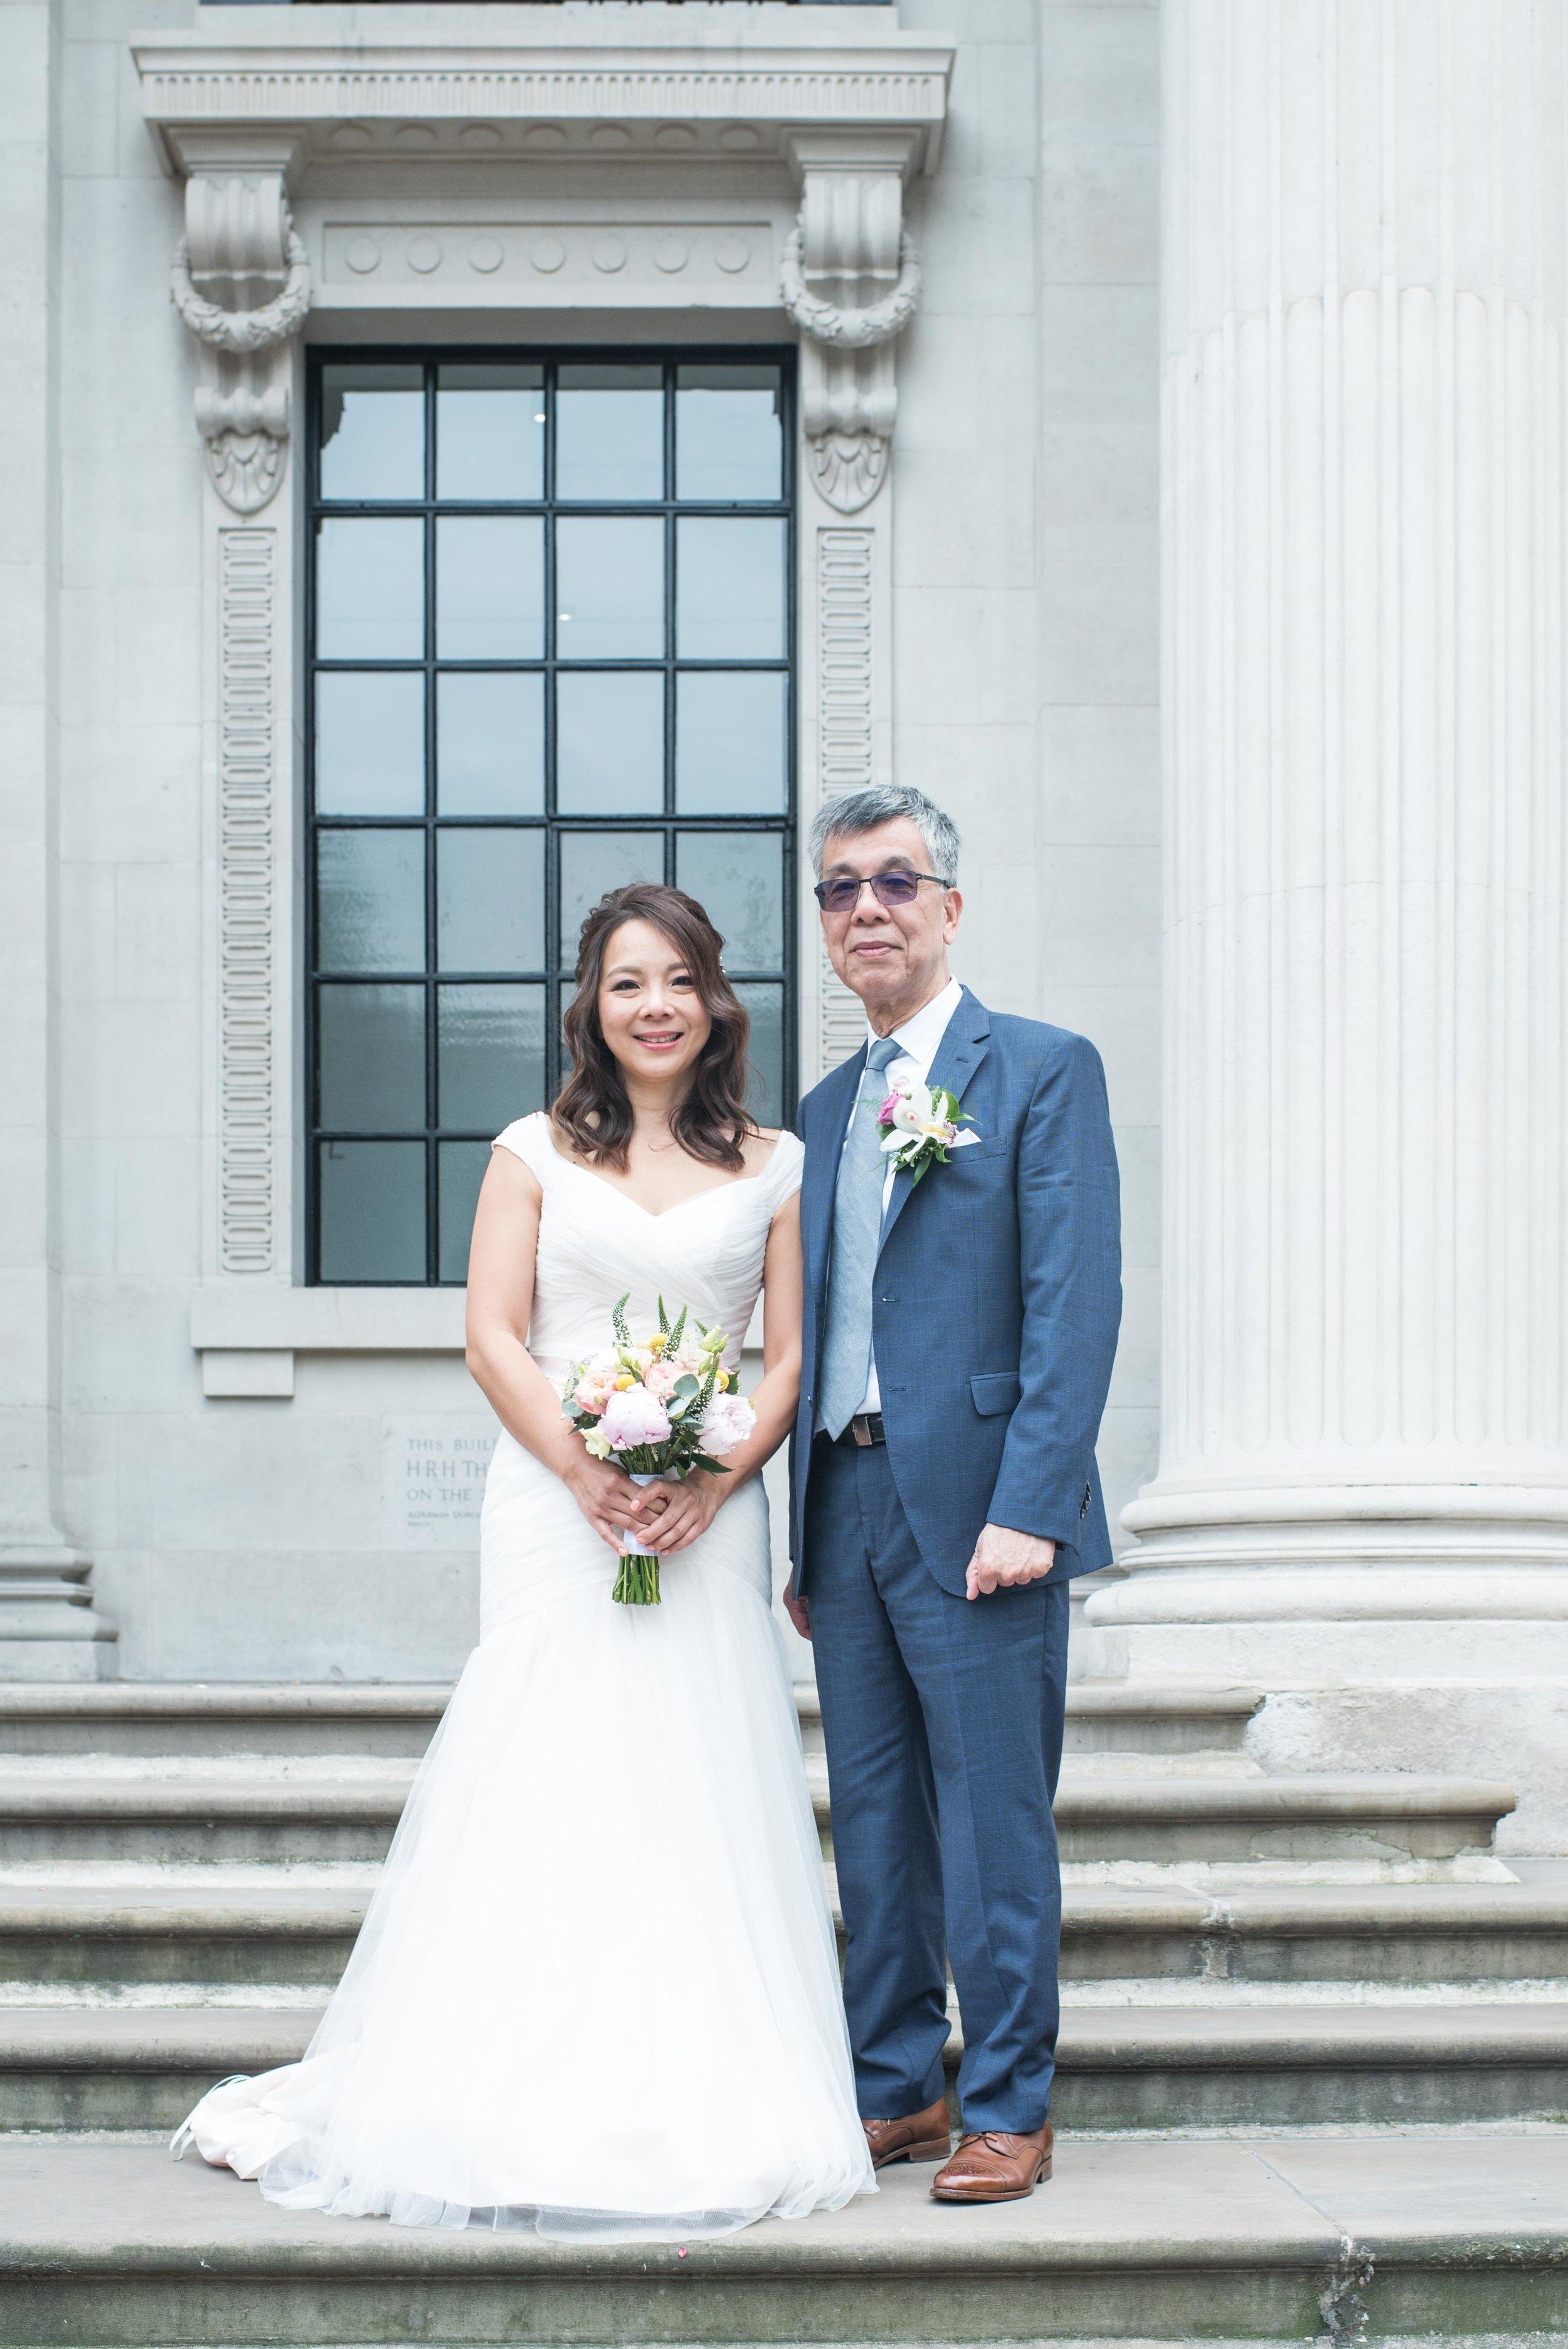 D&M_Marylebone Town Hall Wedding (57 of 239).jpg